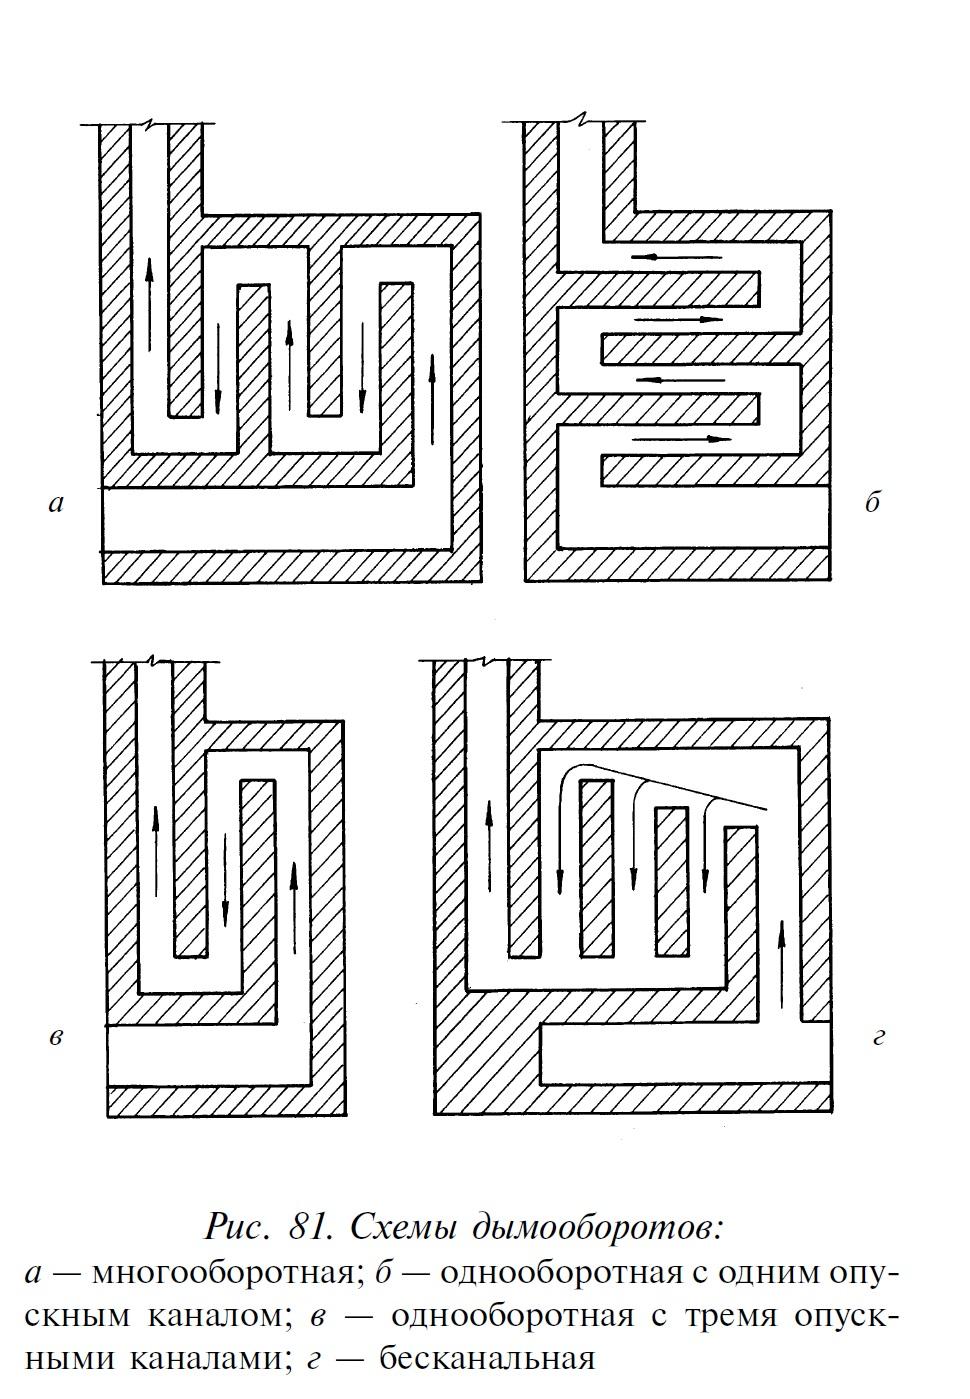 Дымоход из кирпича своими руками: кладка, устройство, схема 51